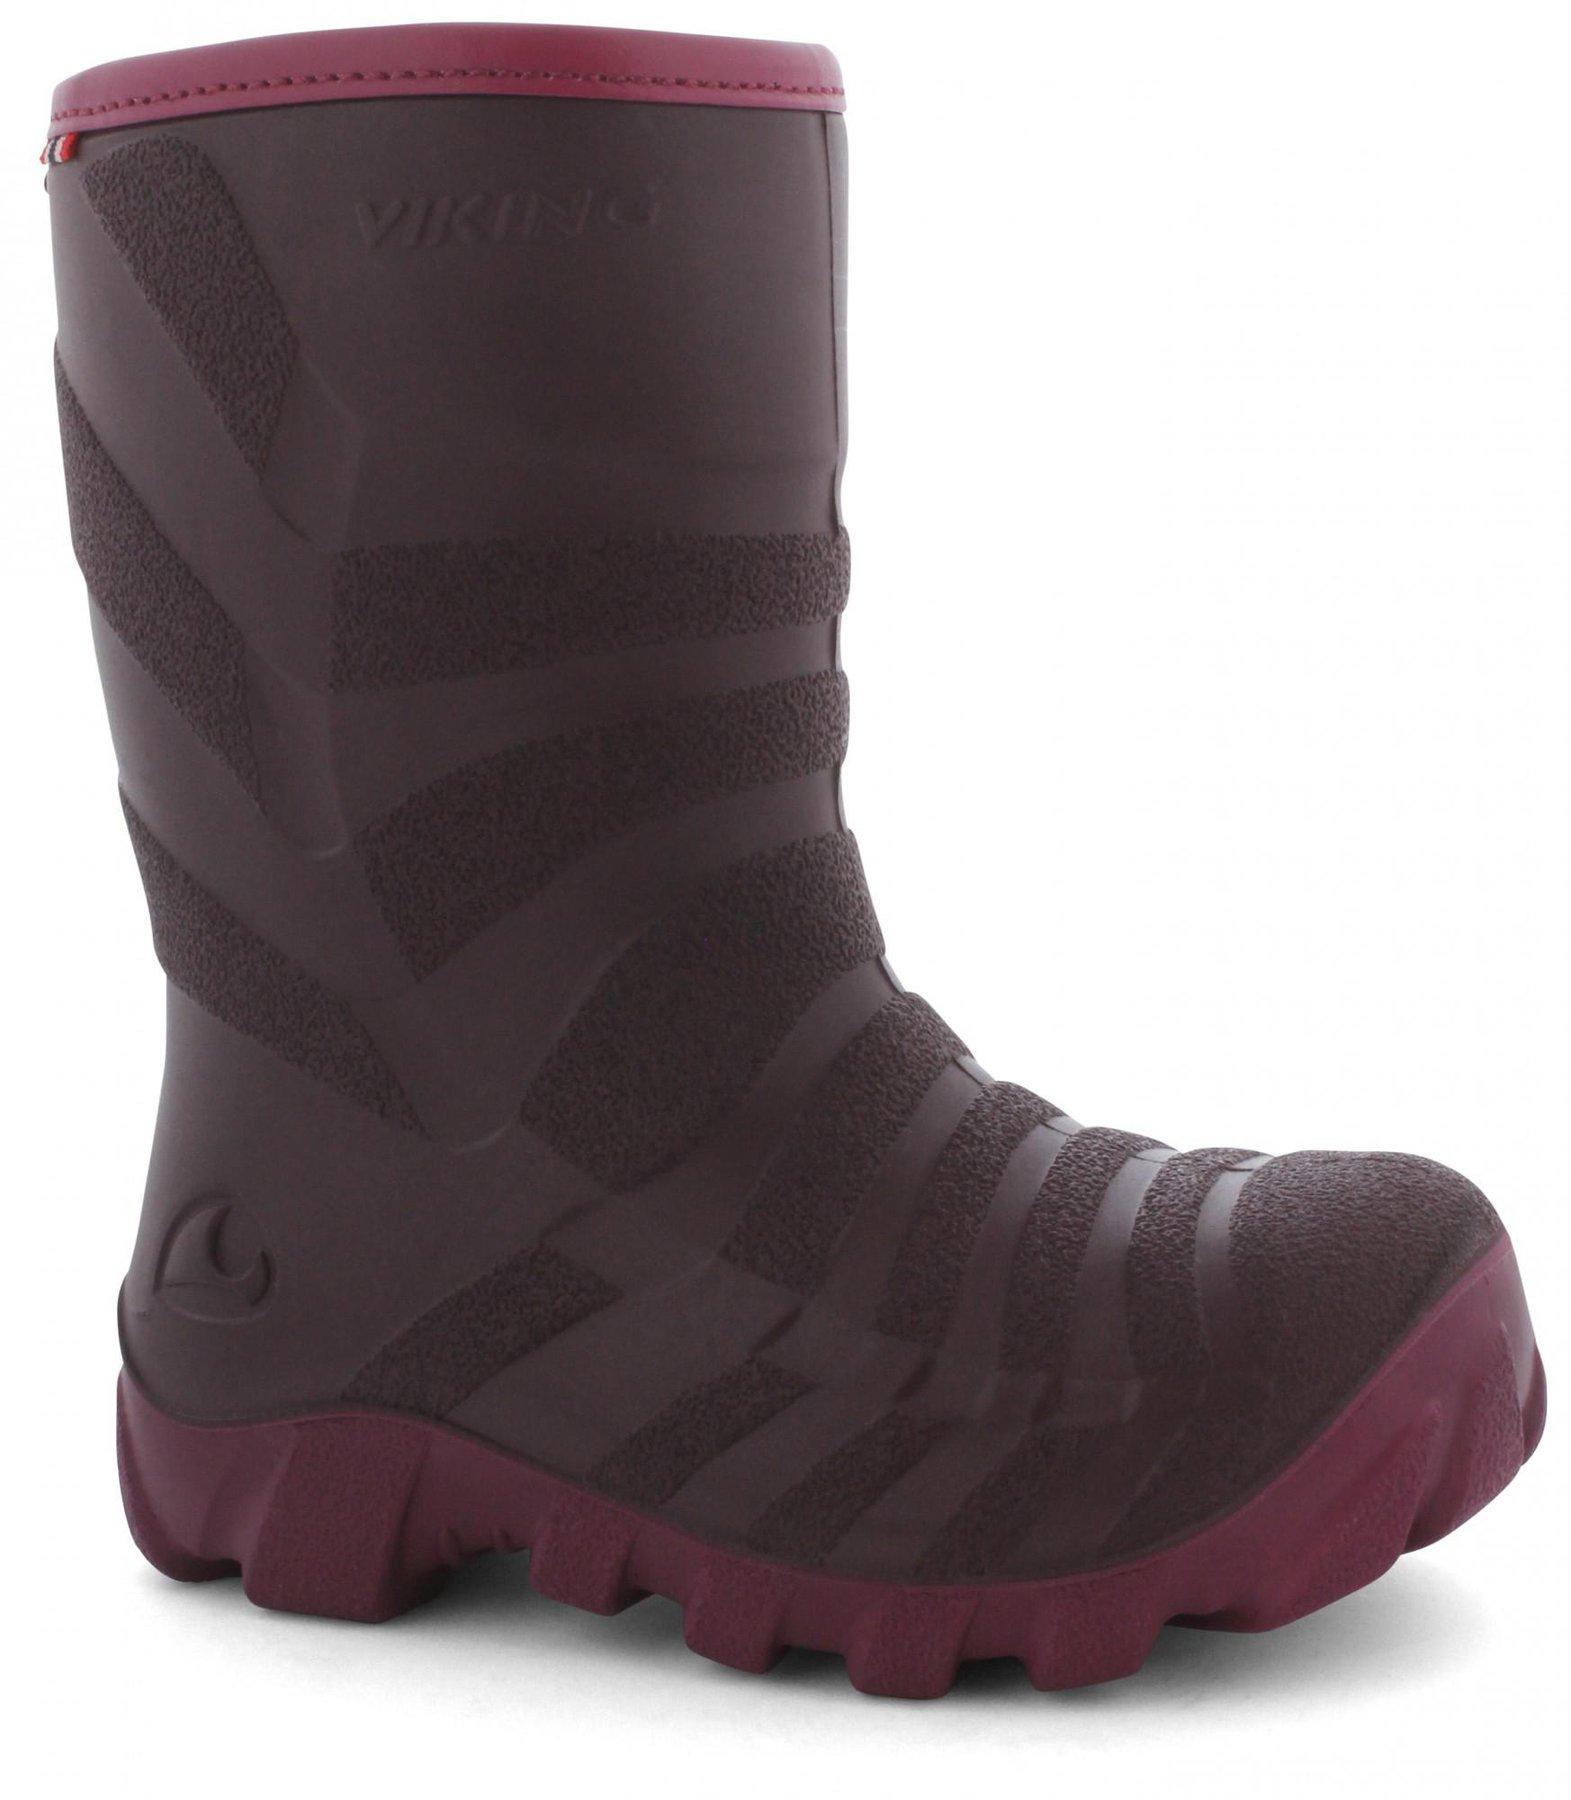 e8130a28ced49c Viking Footwear Thermo Ultra günstig bestellen bei Preis.de✓